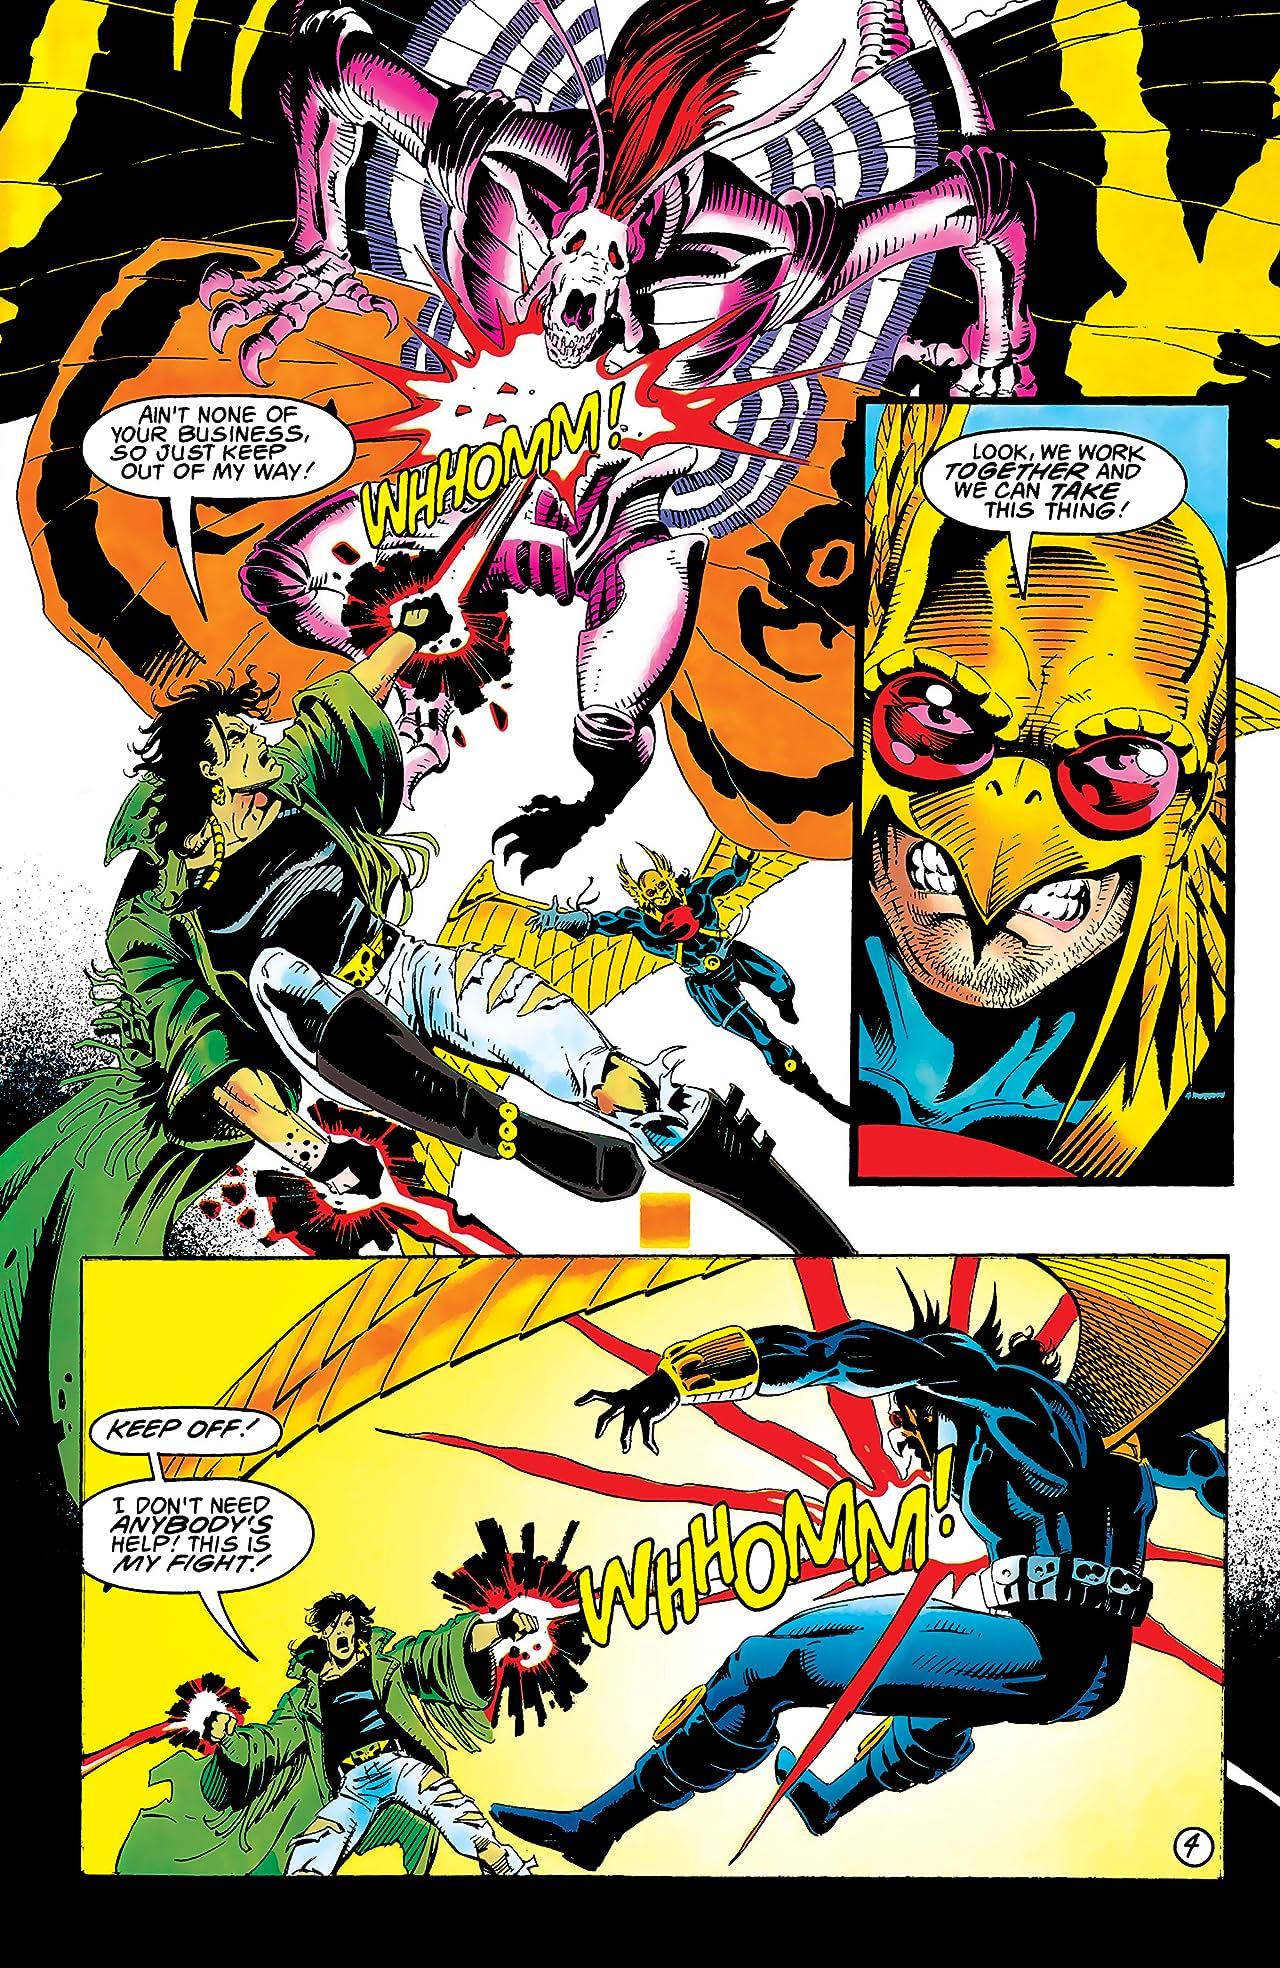 Hawkman (1993-1996) Annual #1